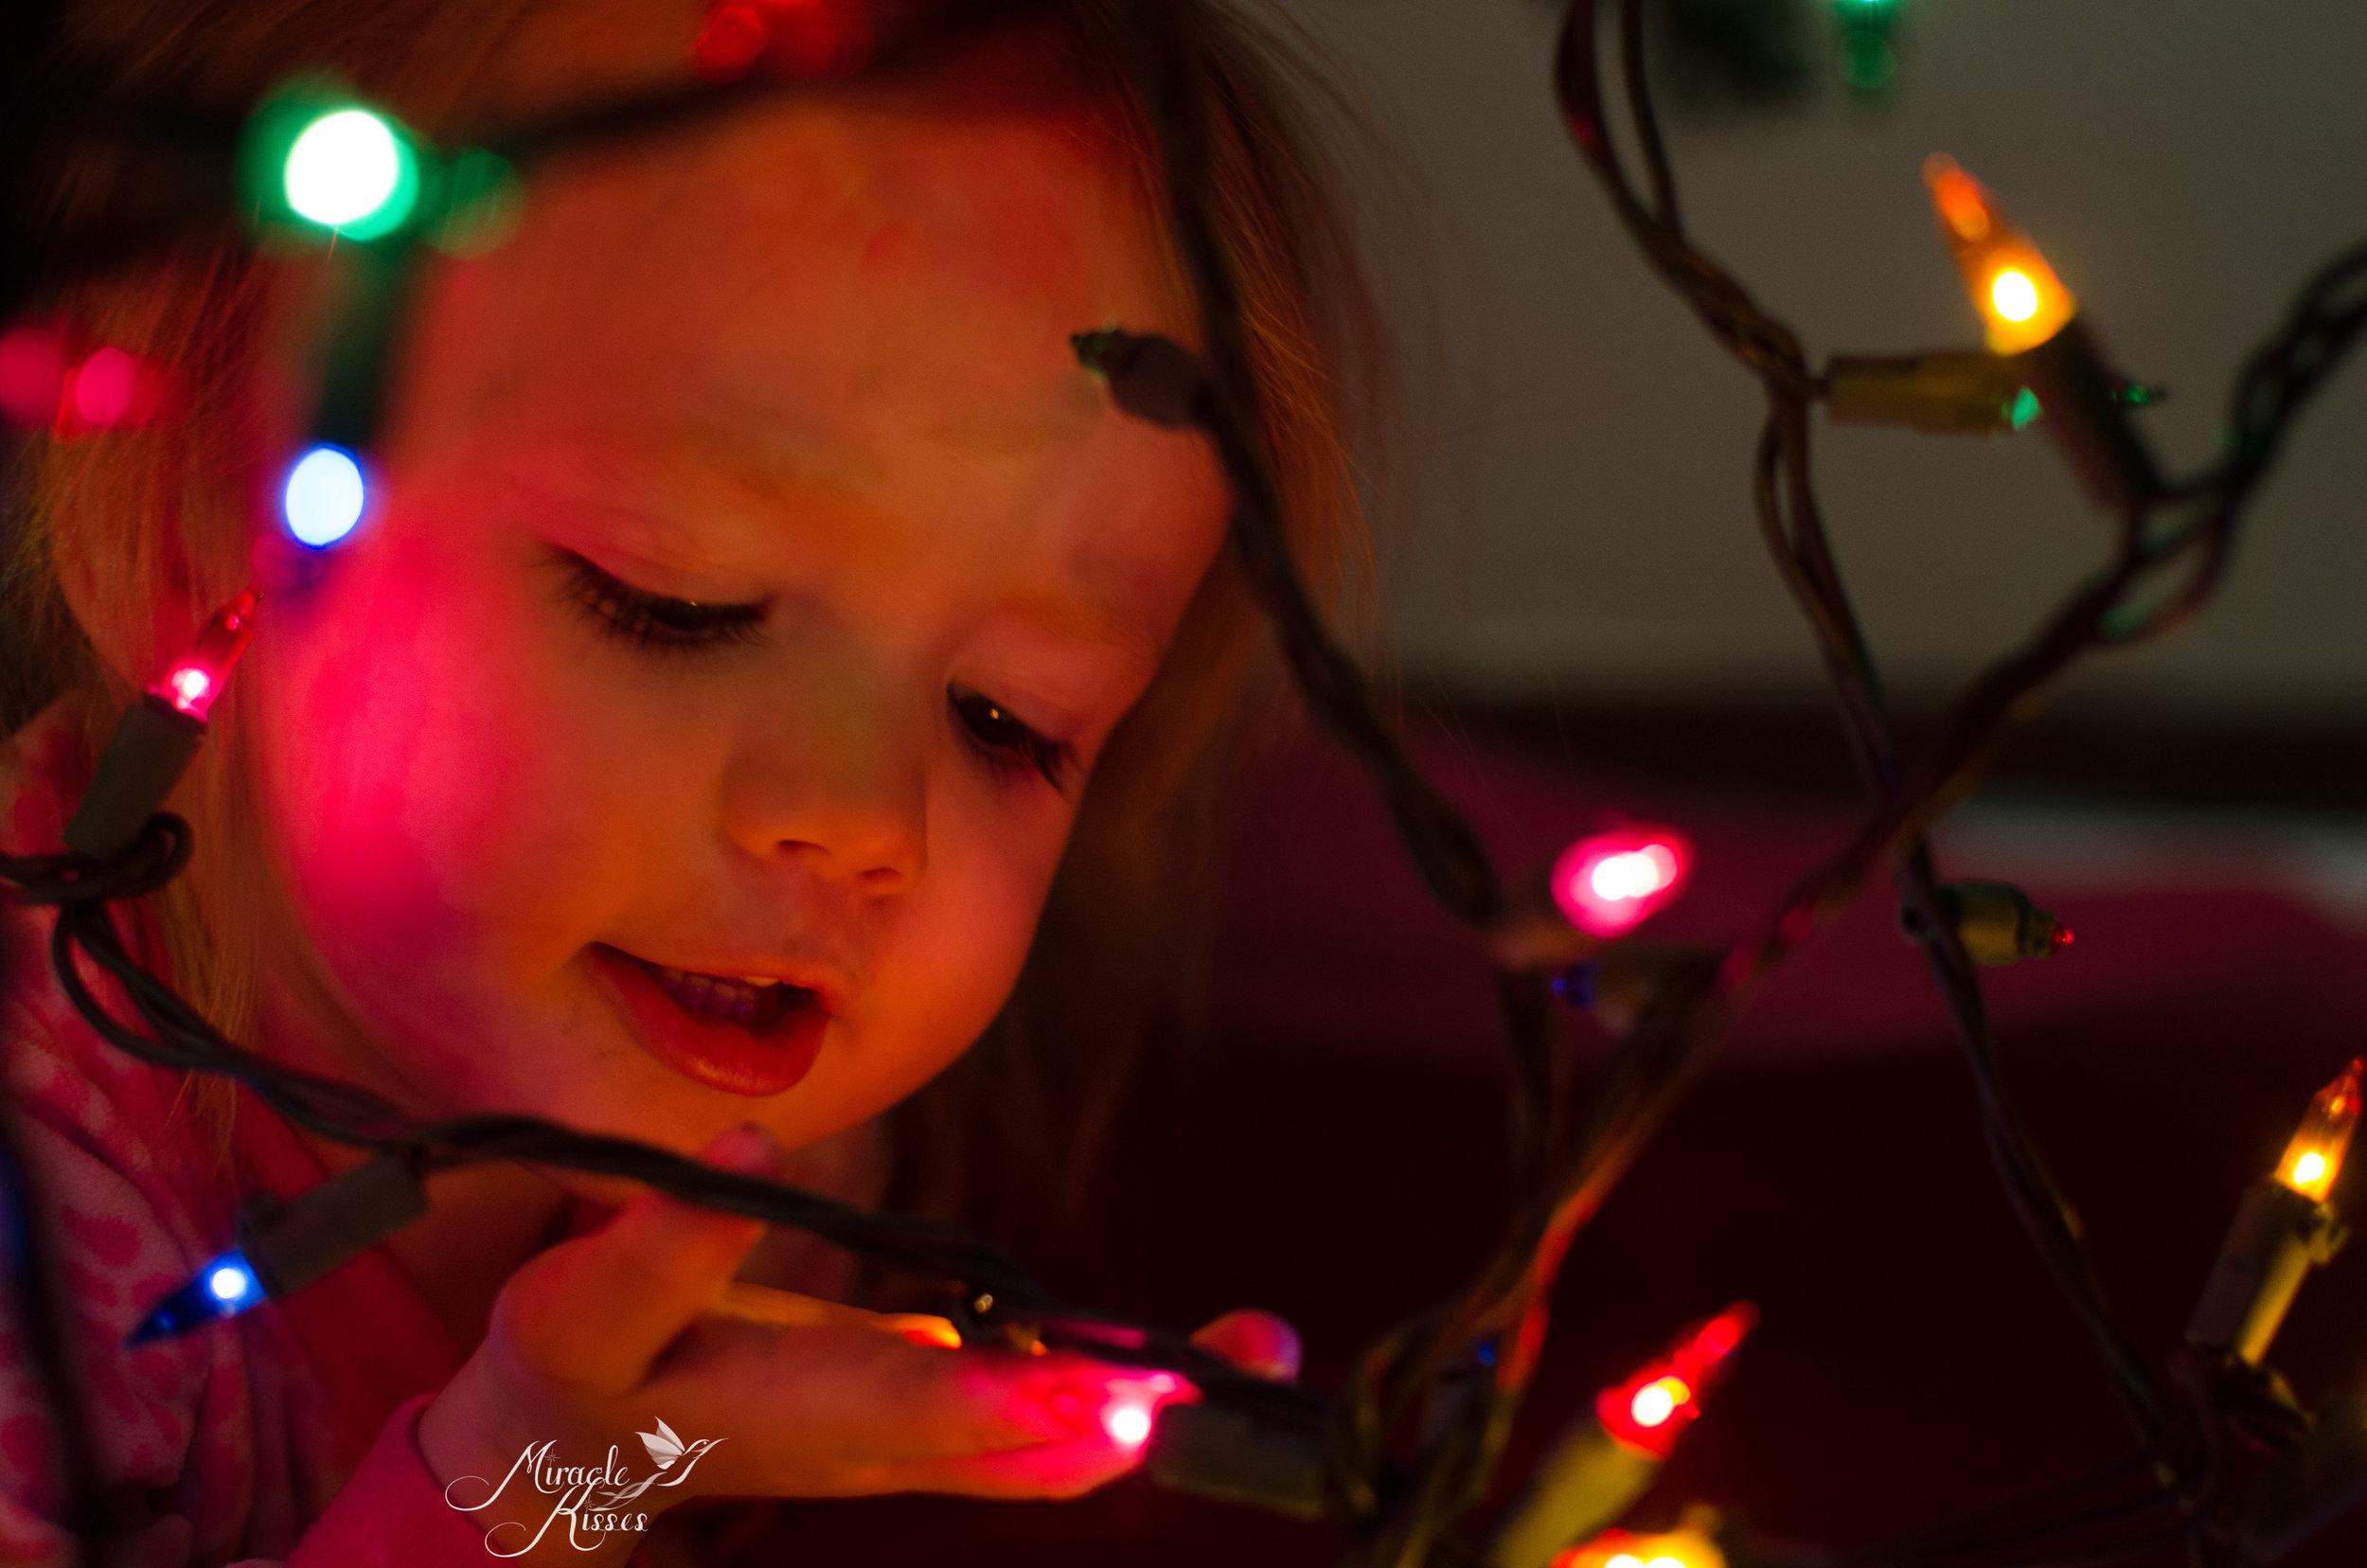 365mk2017, Sparkly, Christmas tree light, child magic